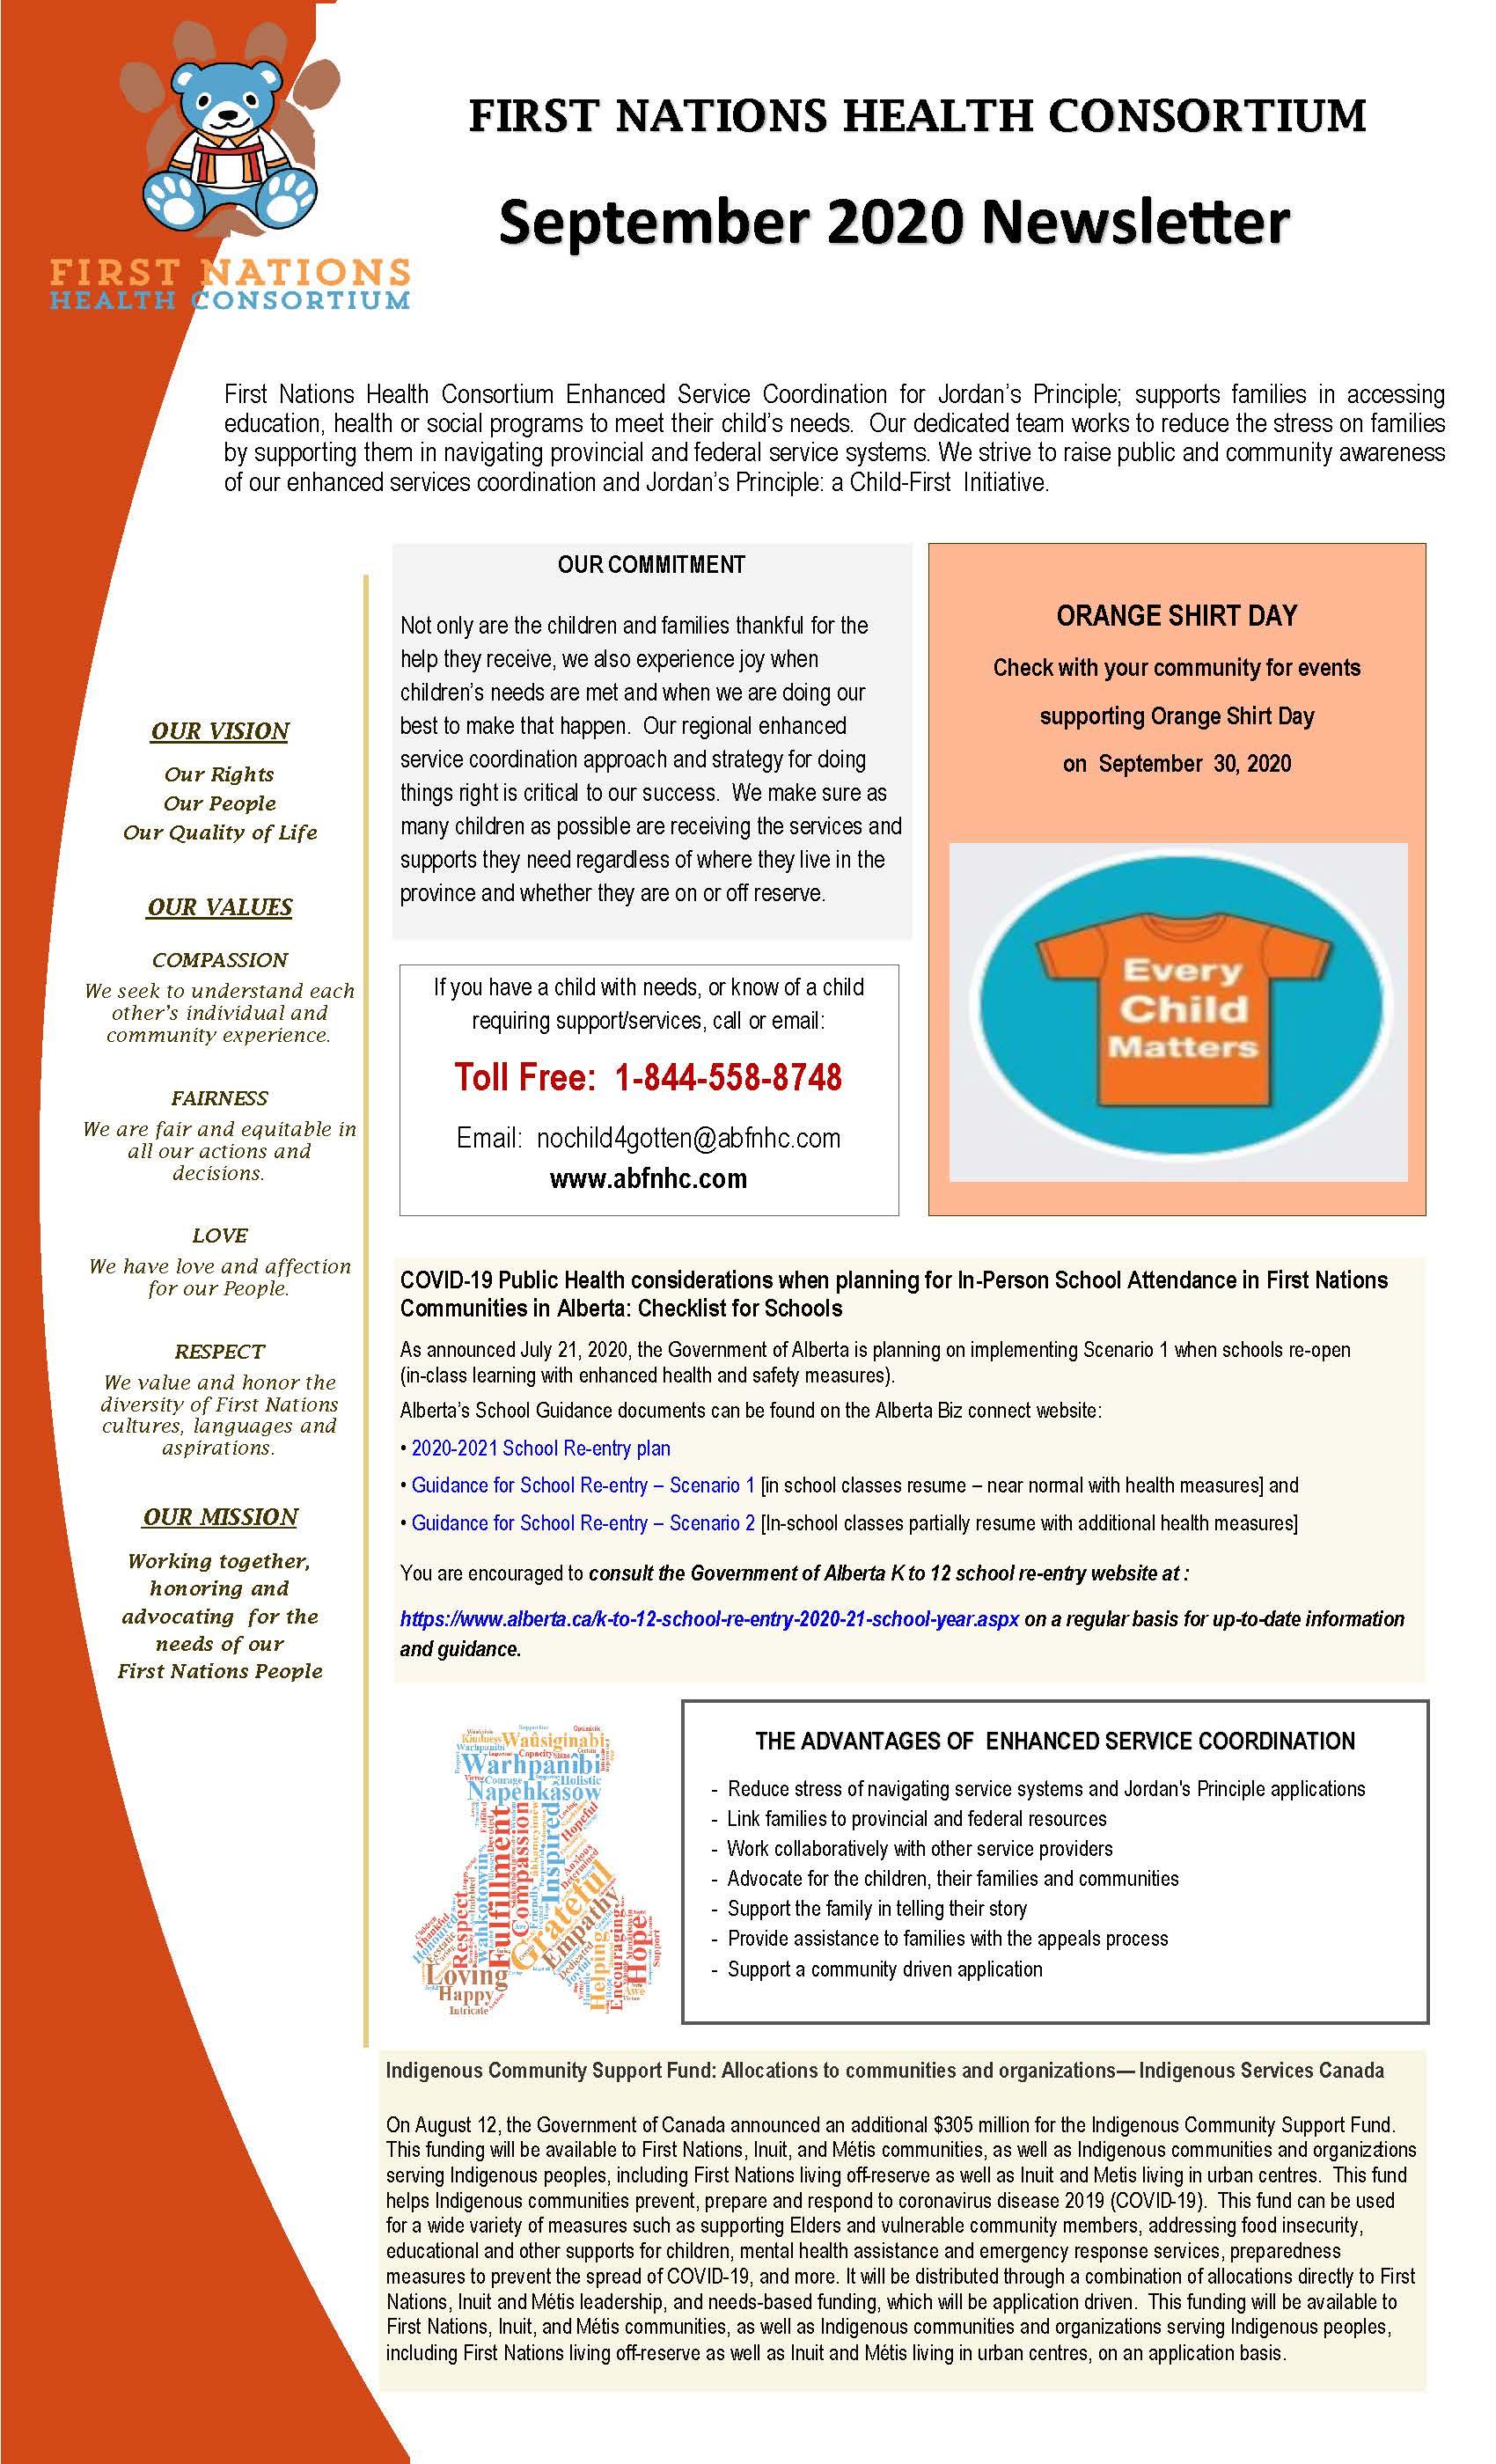 FNHC September 2020 Newsletter_Page_1